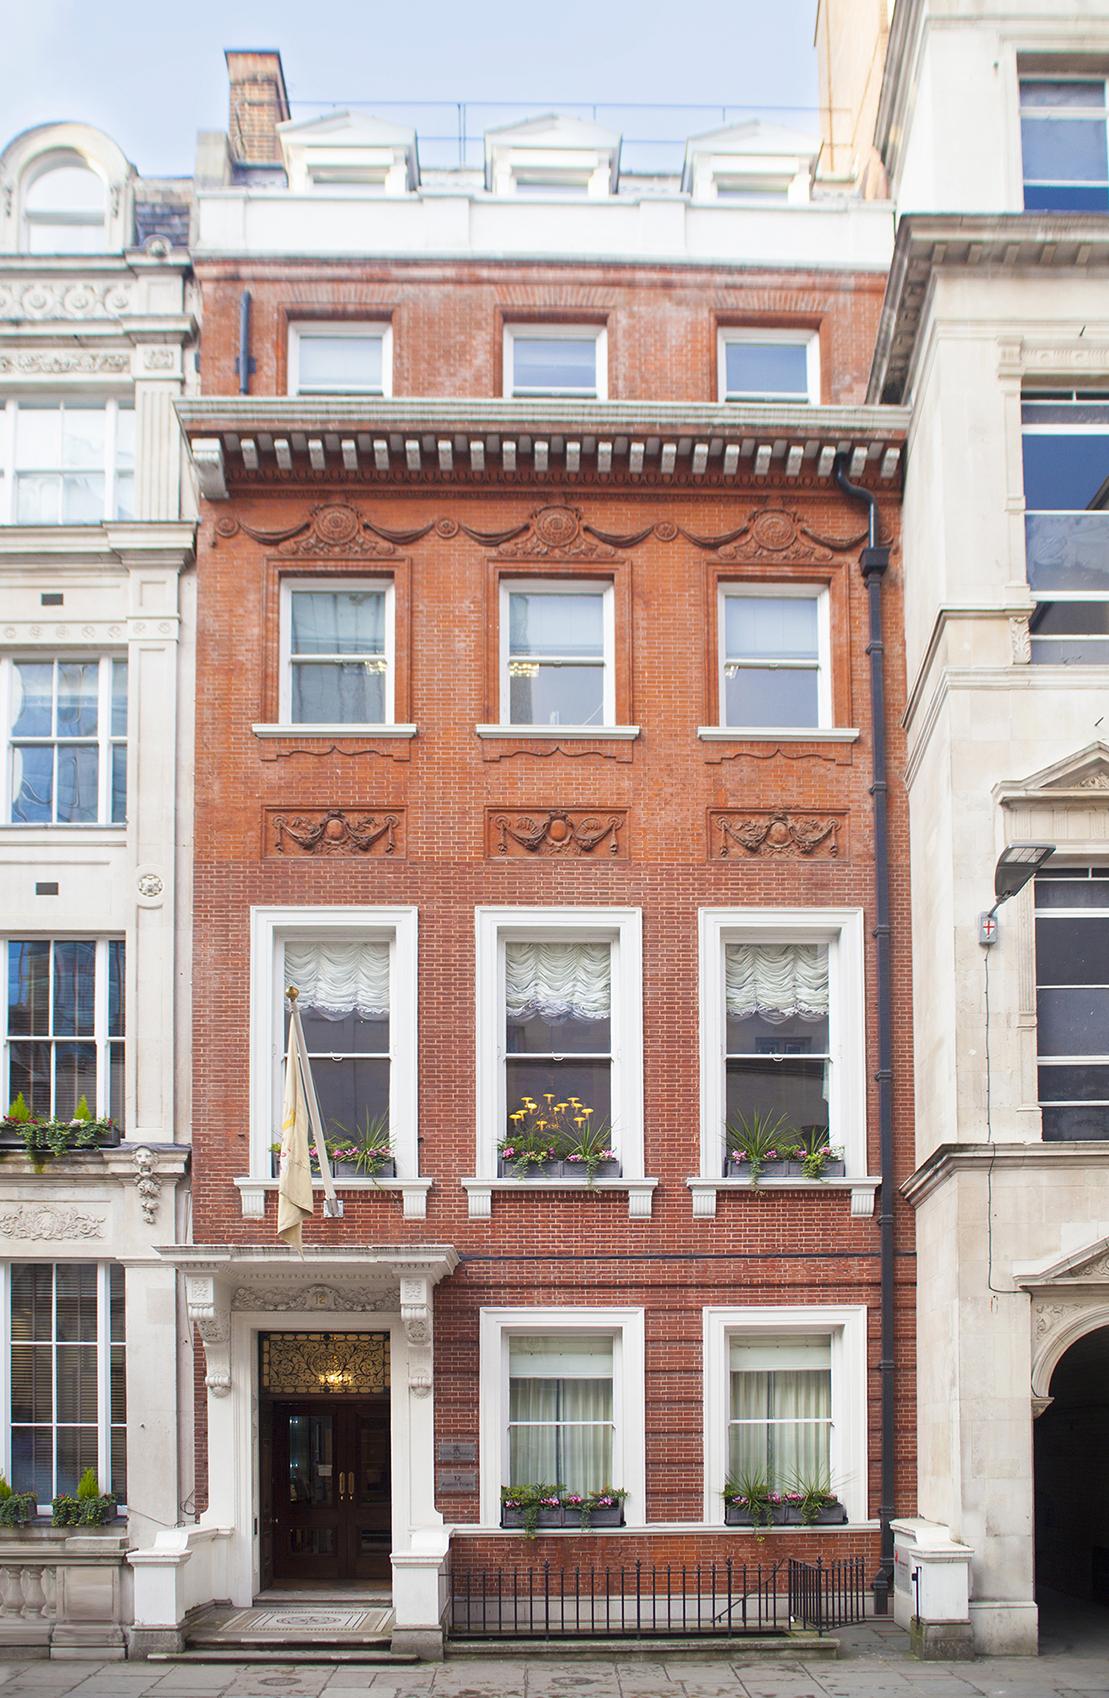 File:The Furniture Makersu0027 Company, 12 Austin Friars, City Of London.